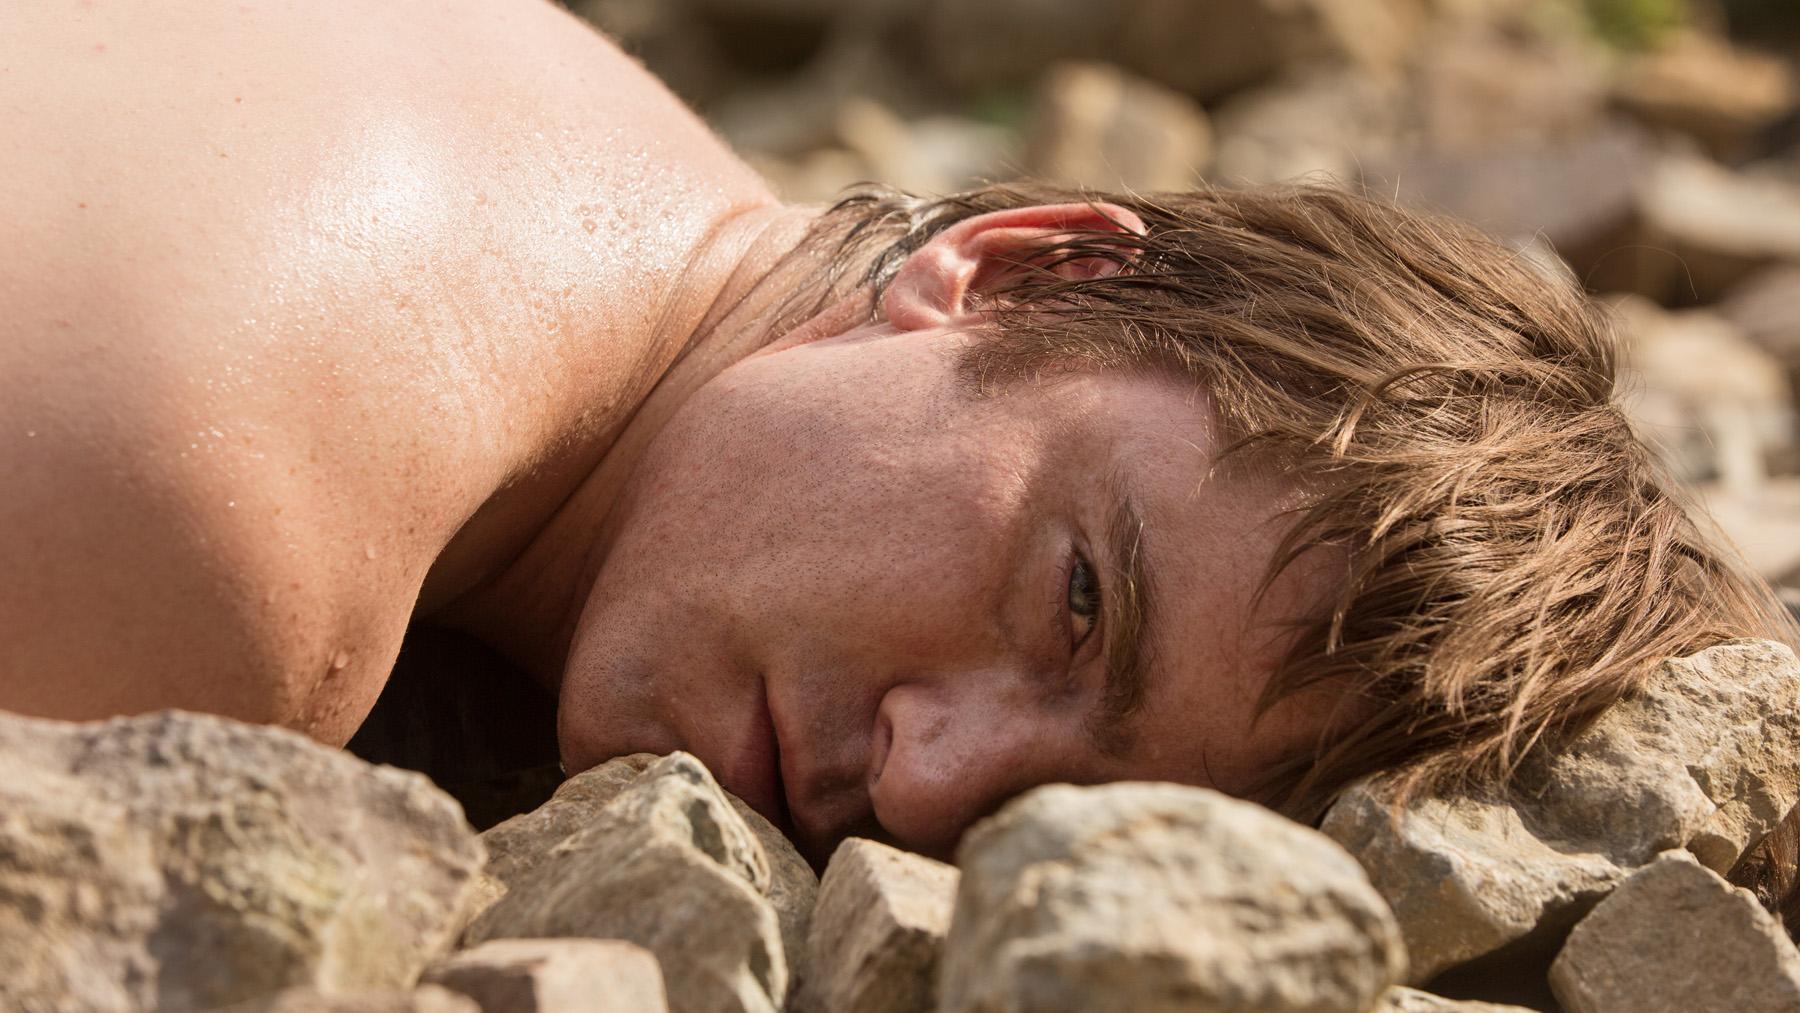 Kevin Janssens in De Patrick, directed by Tim Mielants - DoP Frank Van den Eeden - Courtesy Savage Film